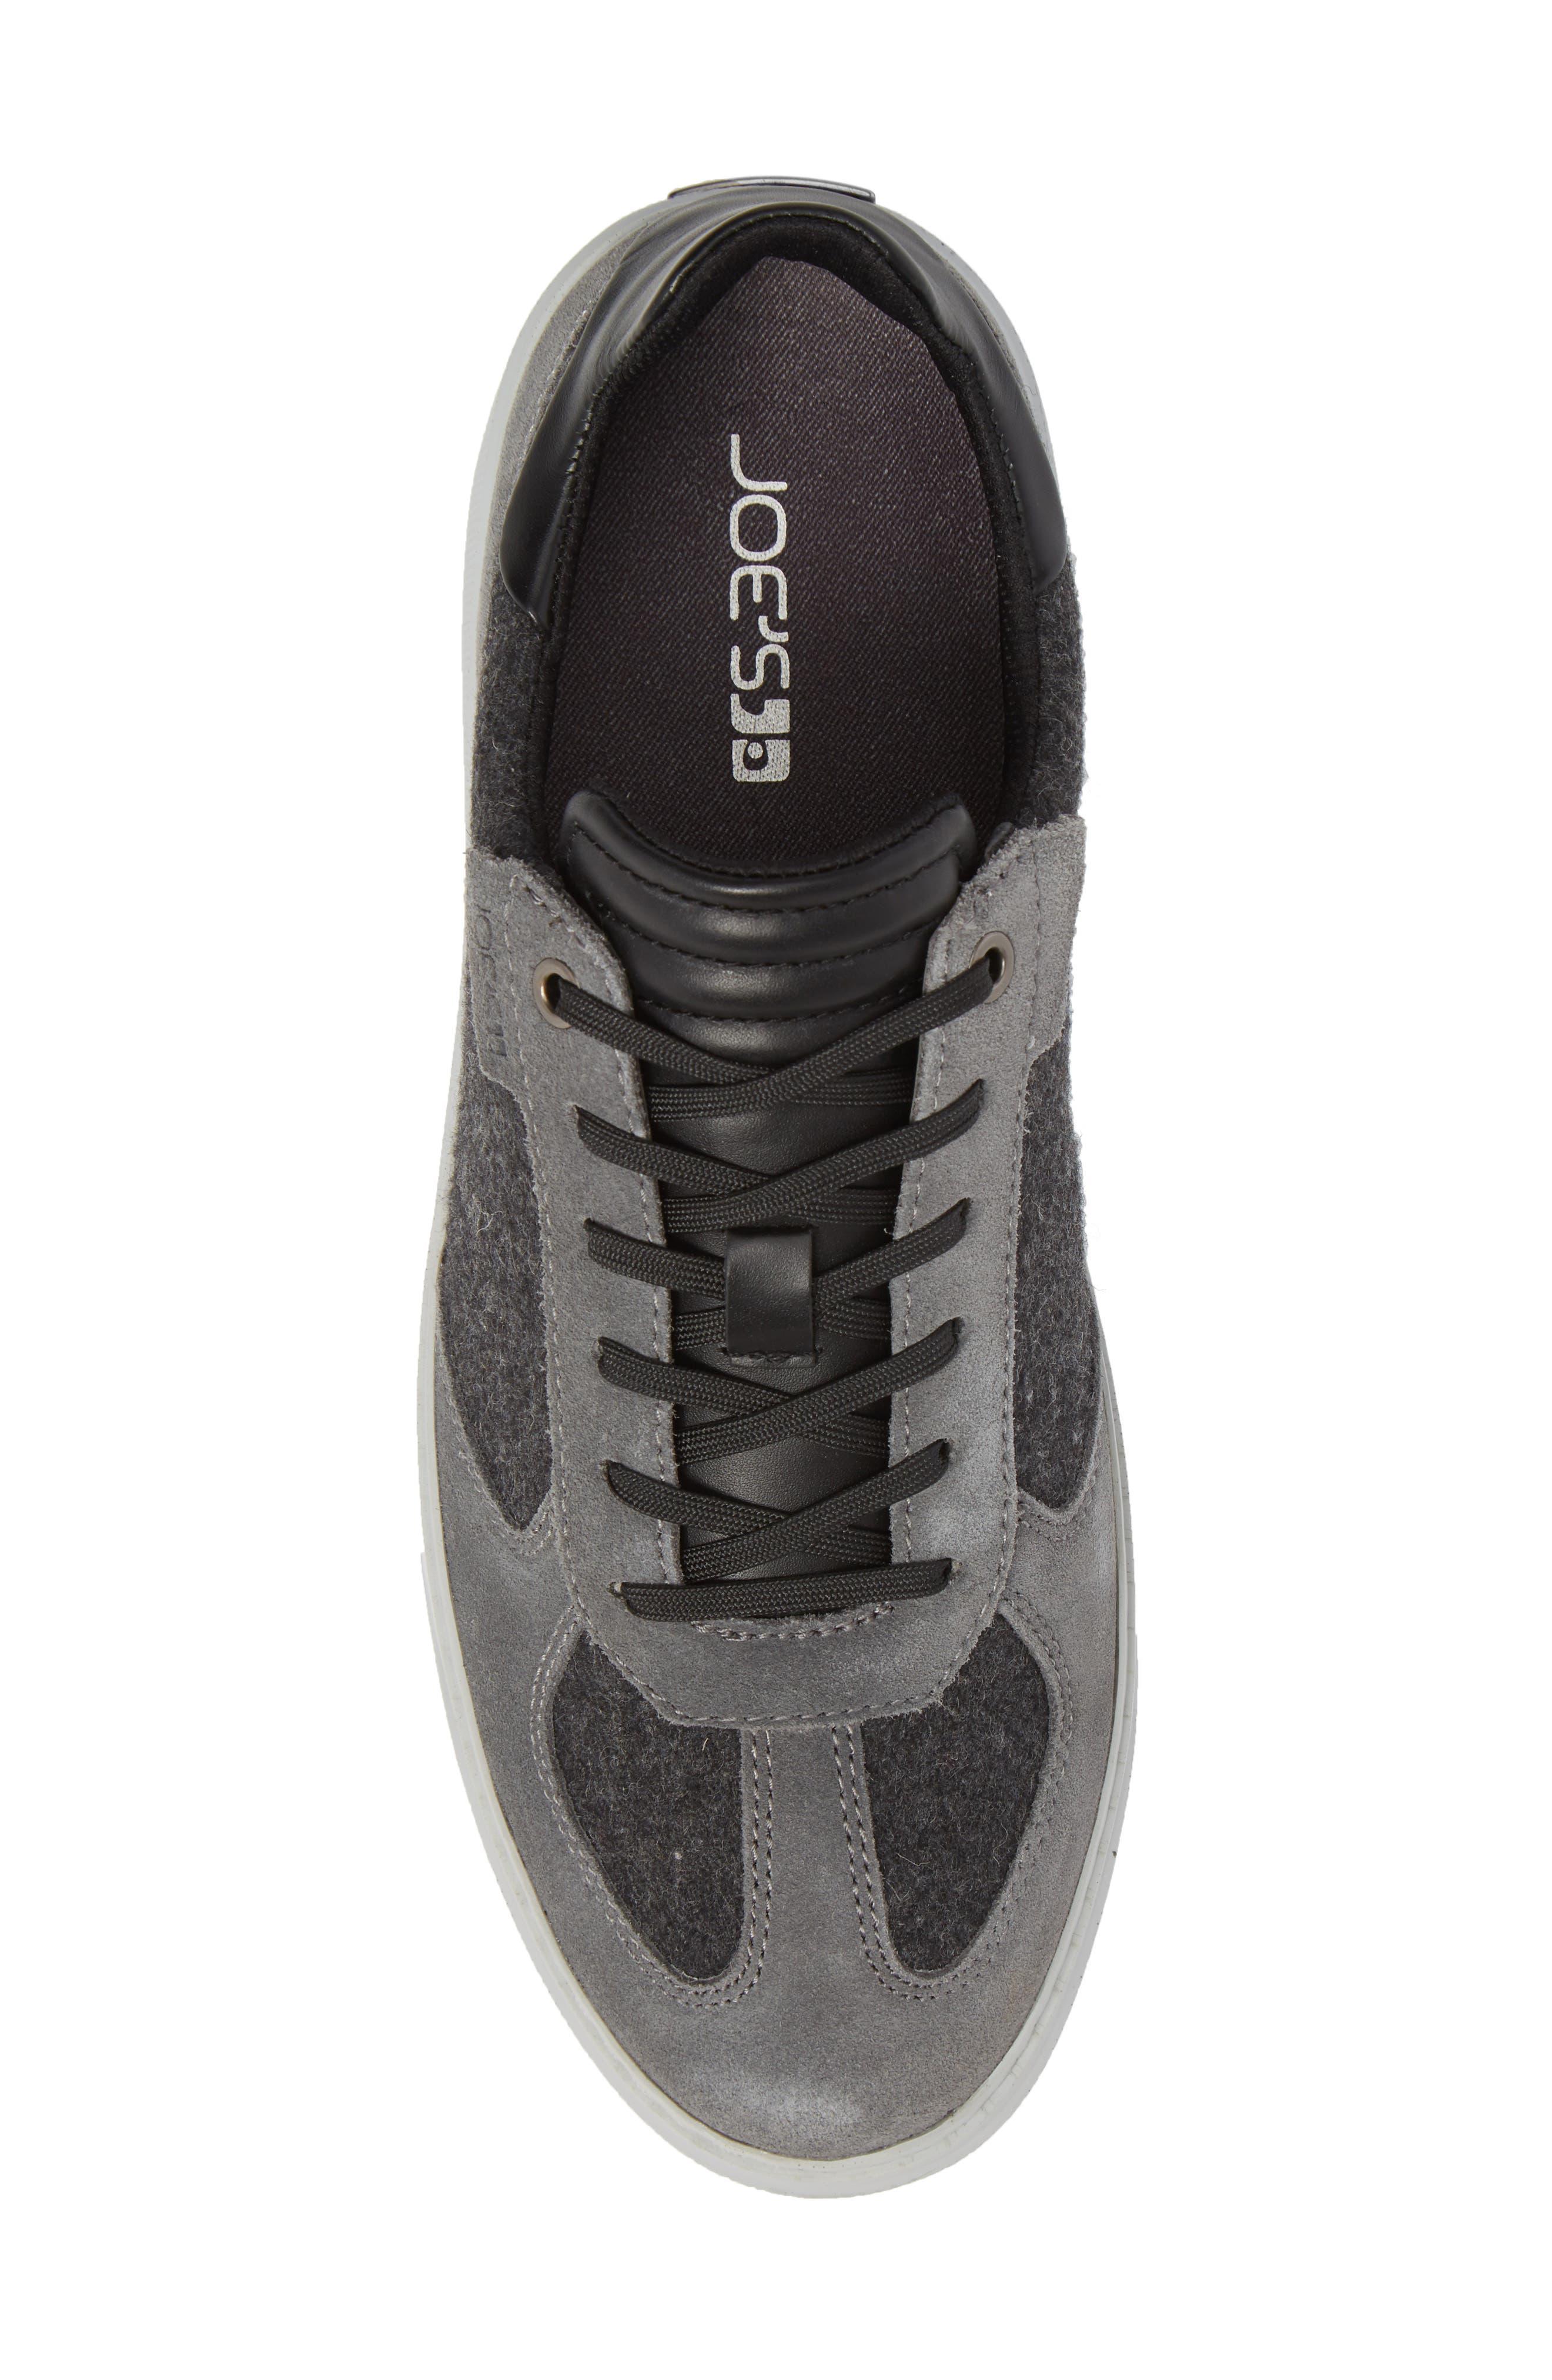 Mo Joe Sneaker,                             Alternate thumbnail 5, color,                             Charcoal Wool/ Suede